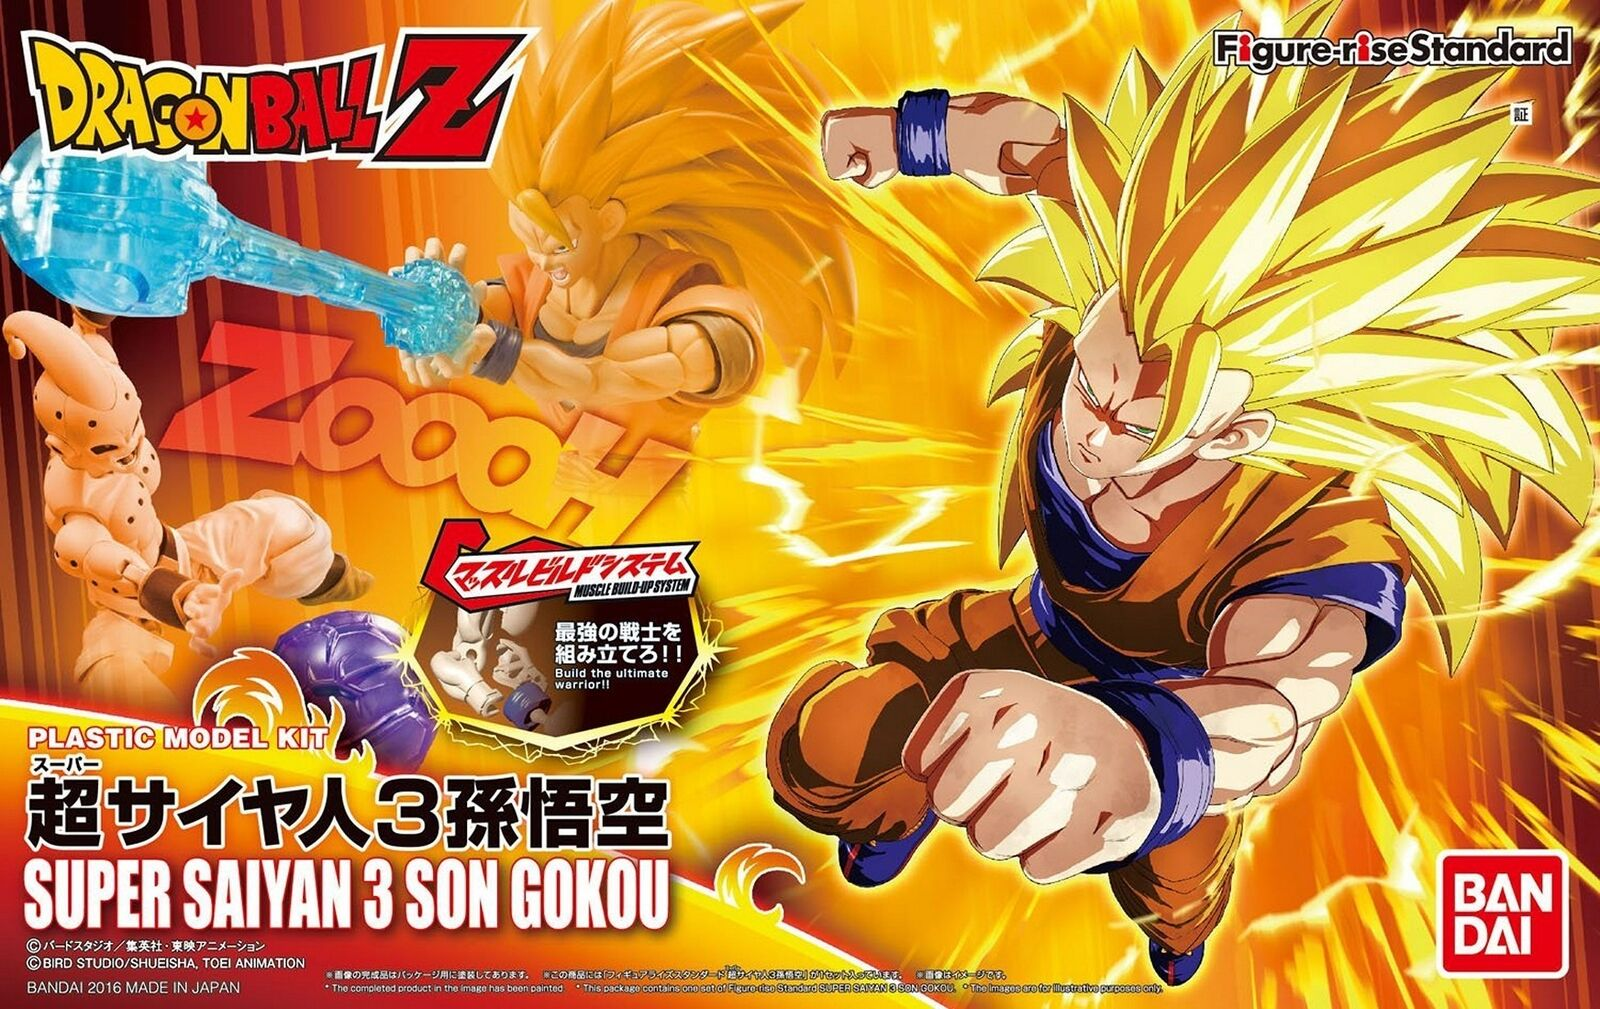 "Bandai Super Saiyan 3 Son Goku ""Dragon Ball Z"" (New PKG Version), Bandai Figure-rise Standard"